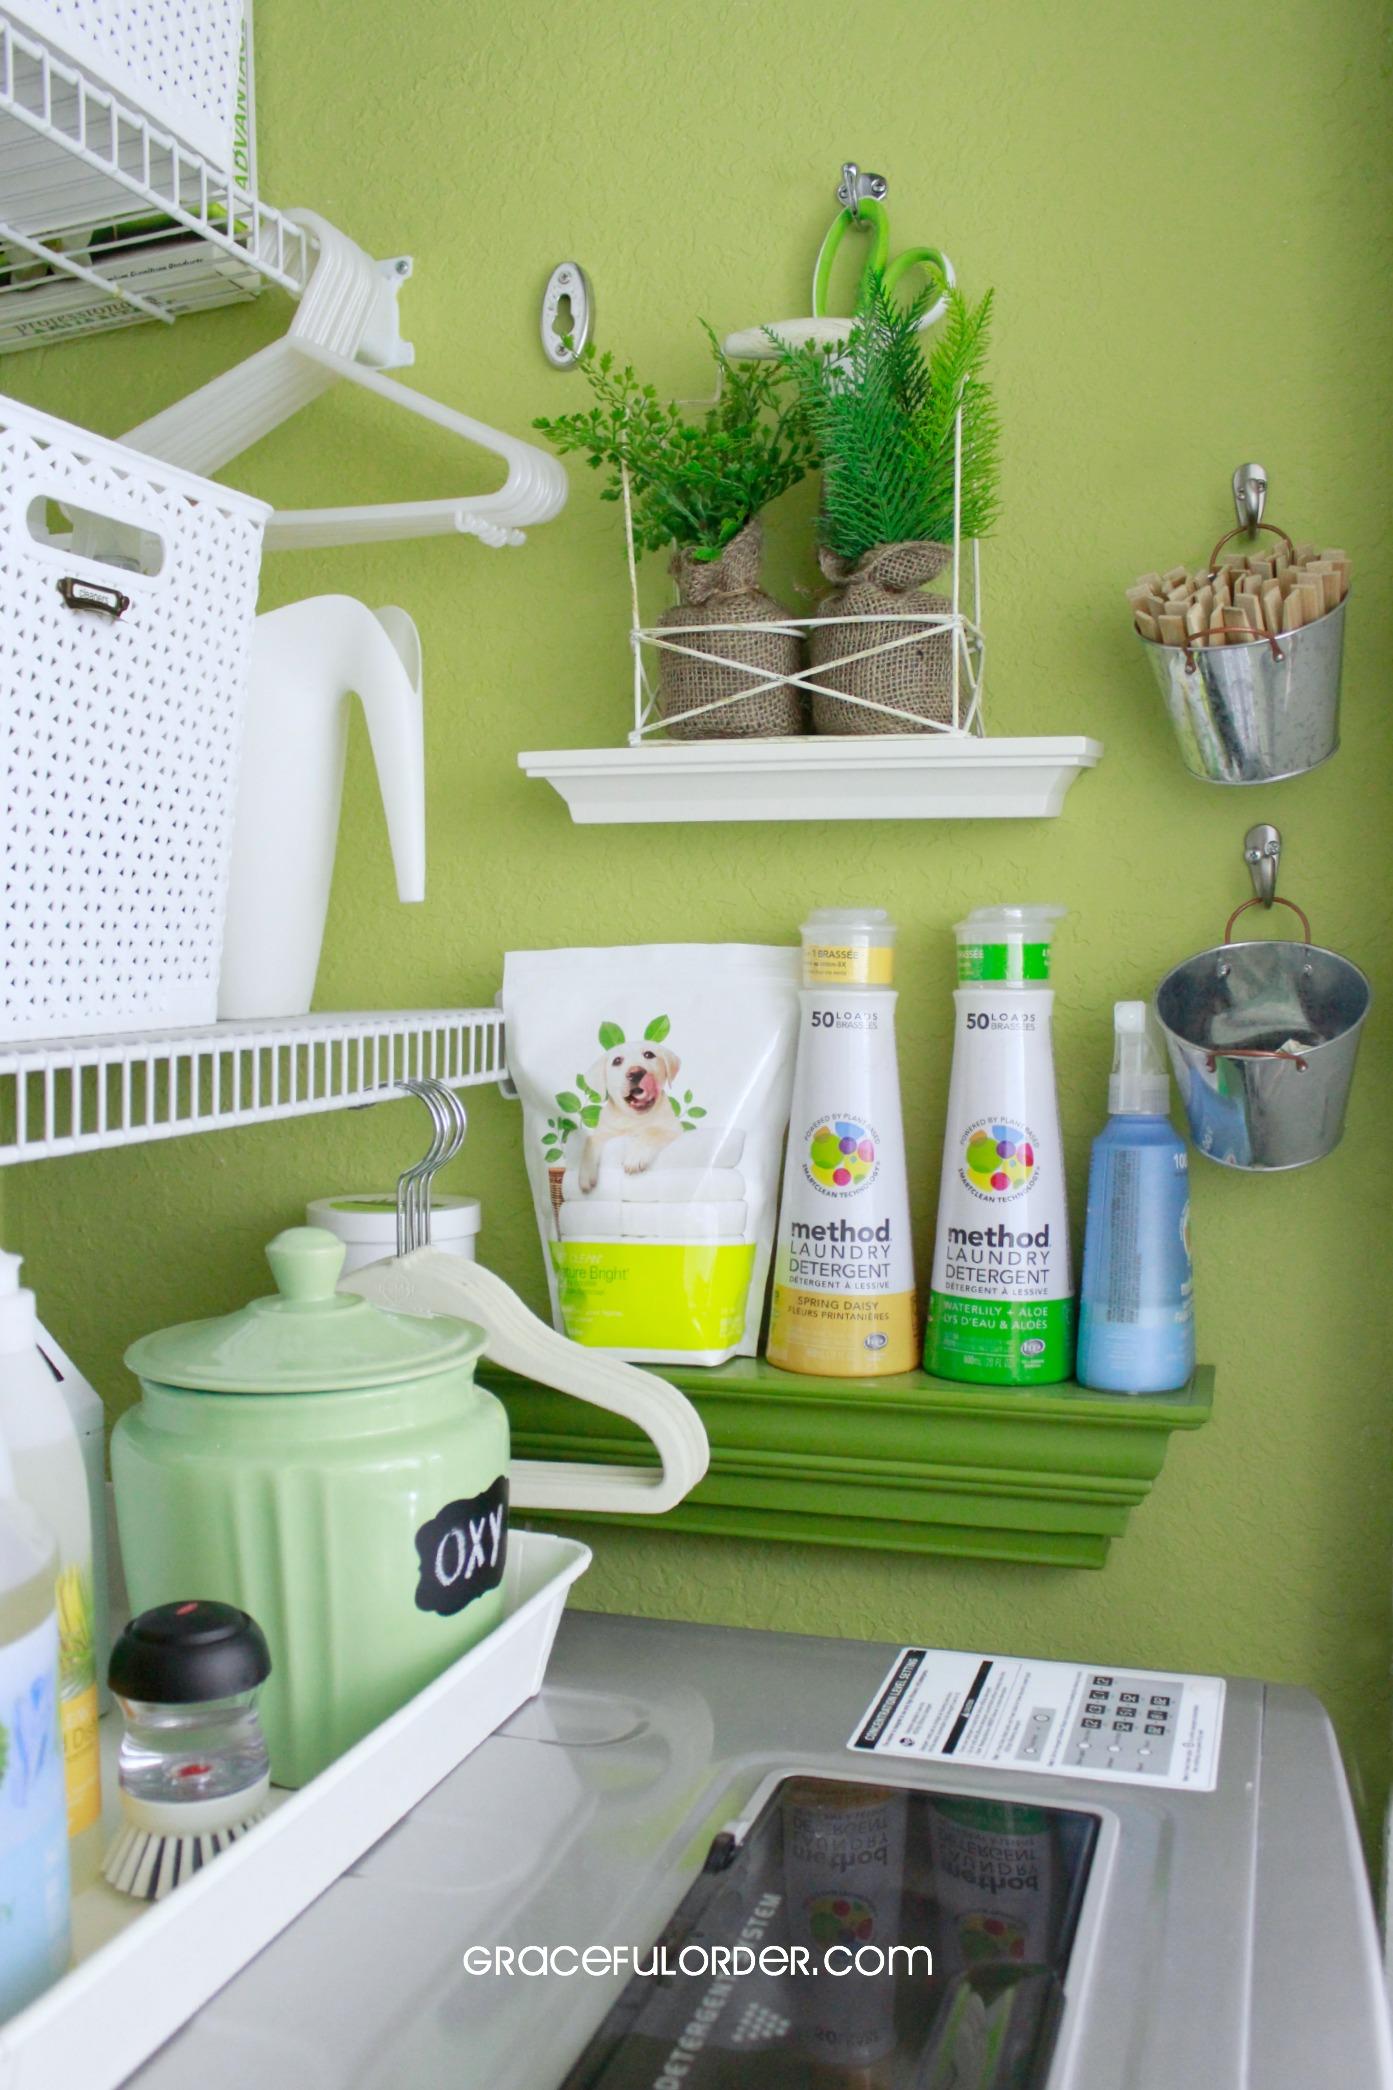 Laundry Room Organization Ideas - Graceful Order on Laundry Room Organization Ideas  id=67207